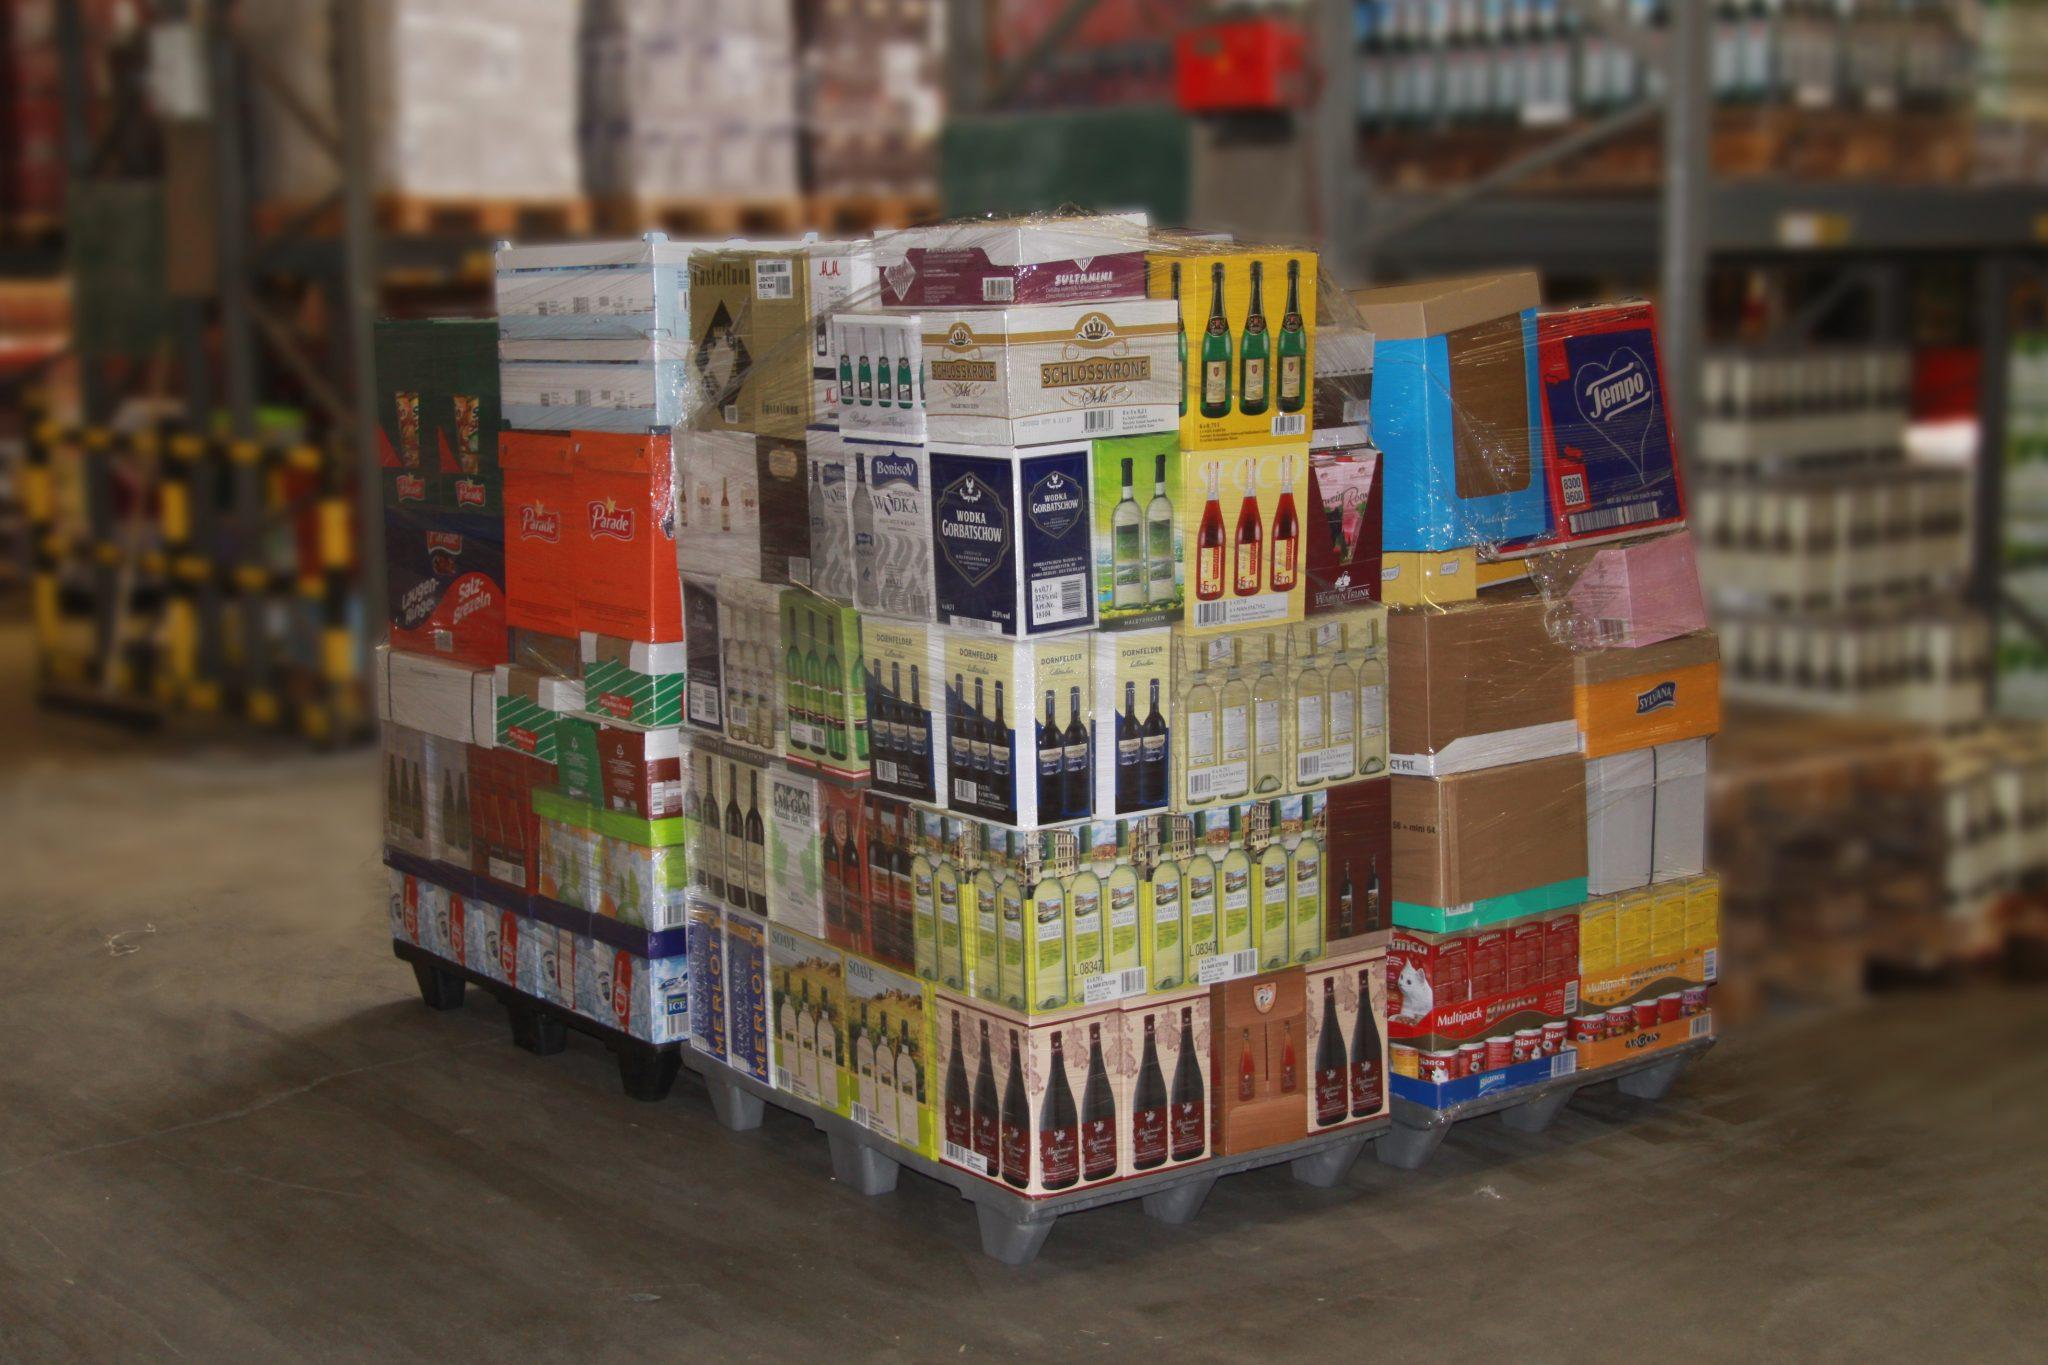 Food Distribution Pallet Admired At Lyon Trade Fair